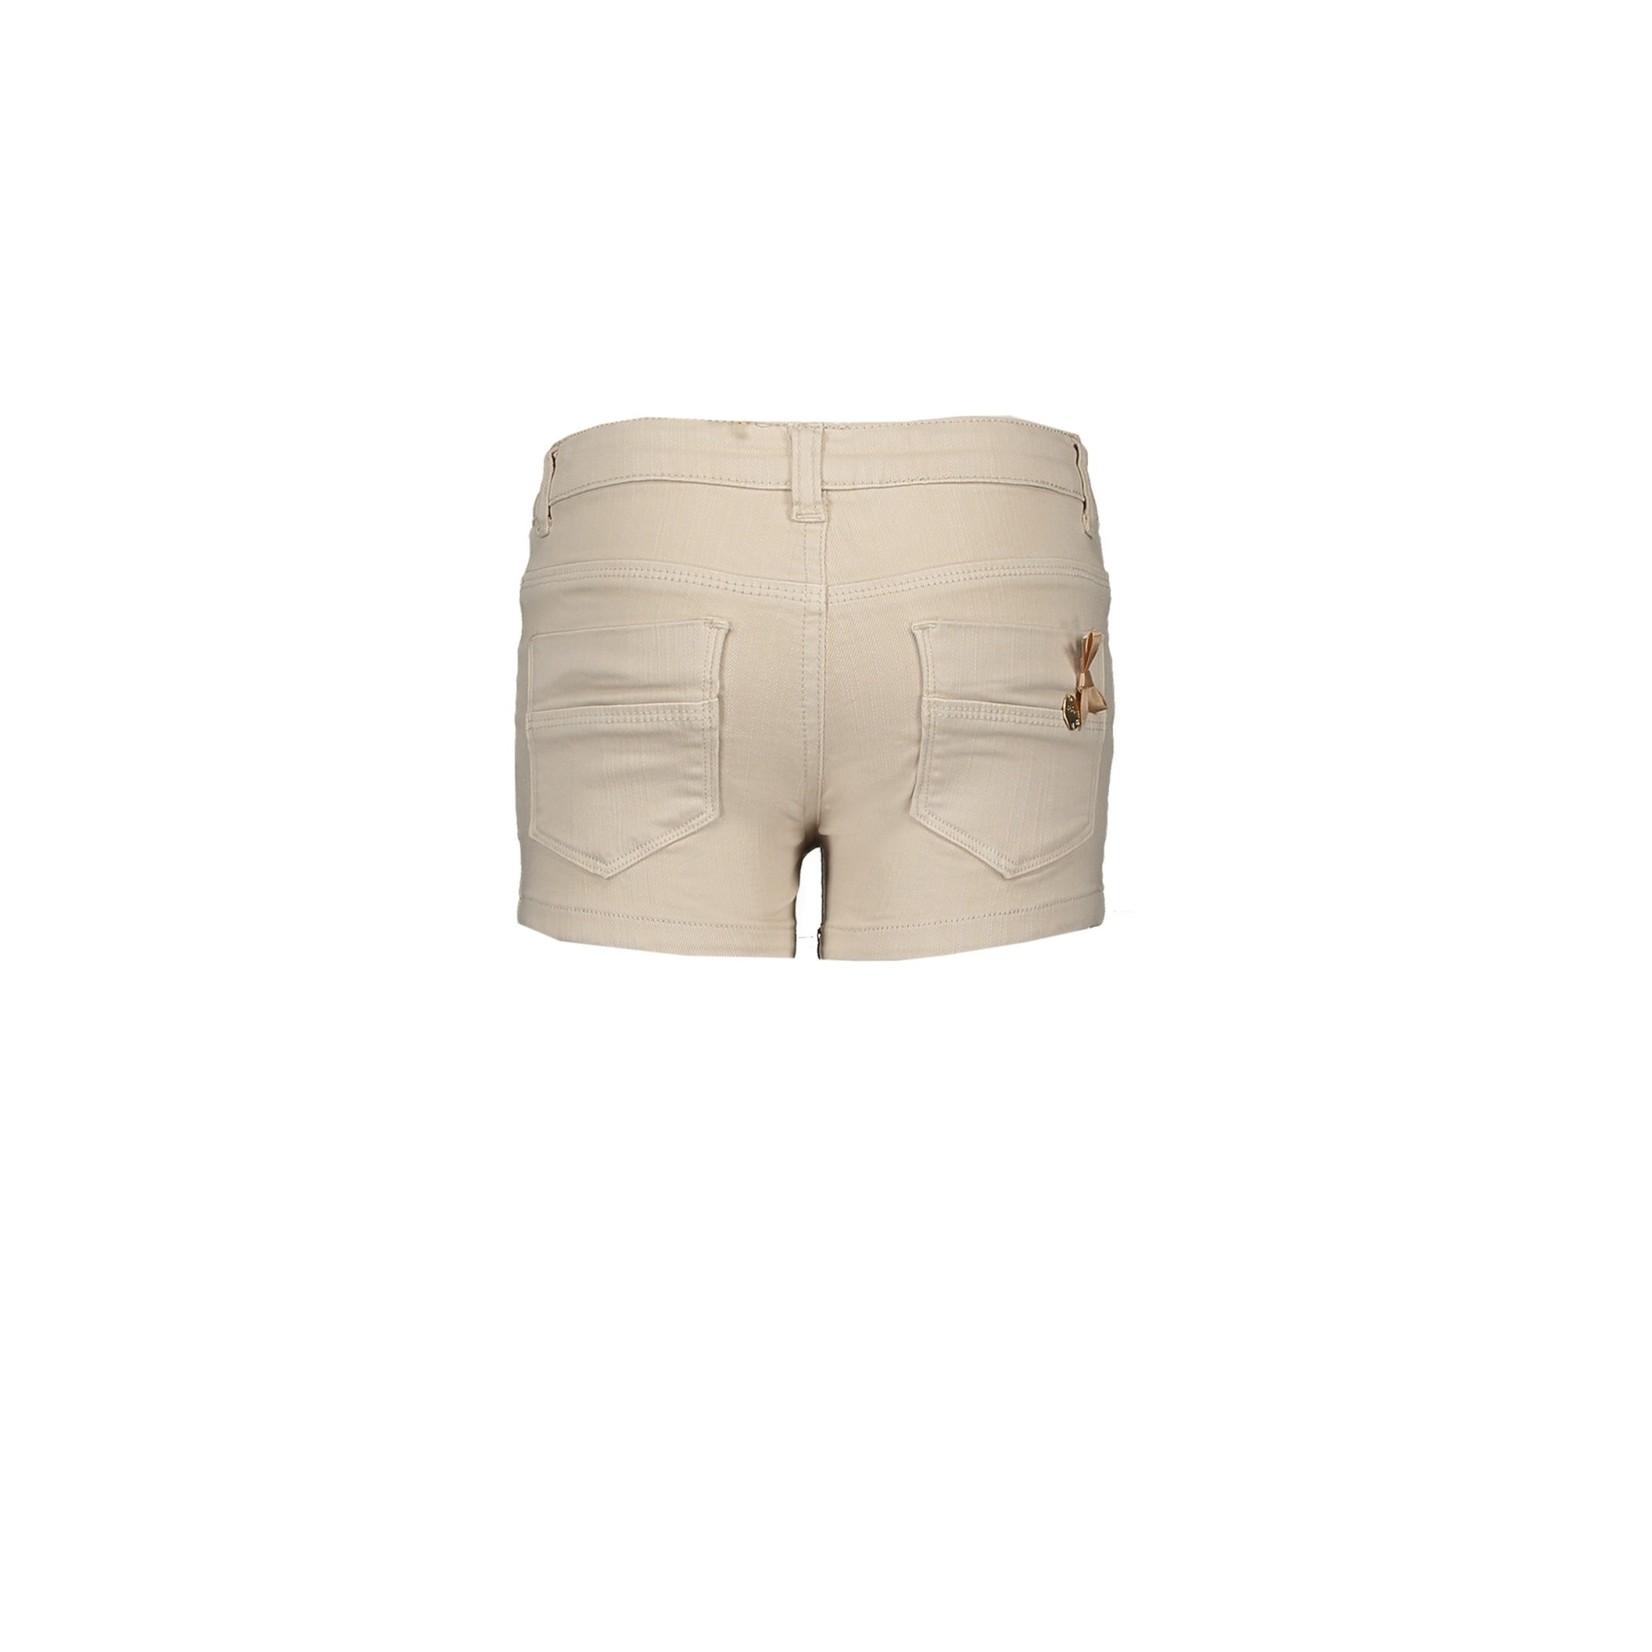 Le Chic Le chic denim shorts studs & pearls